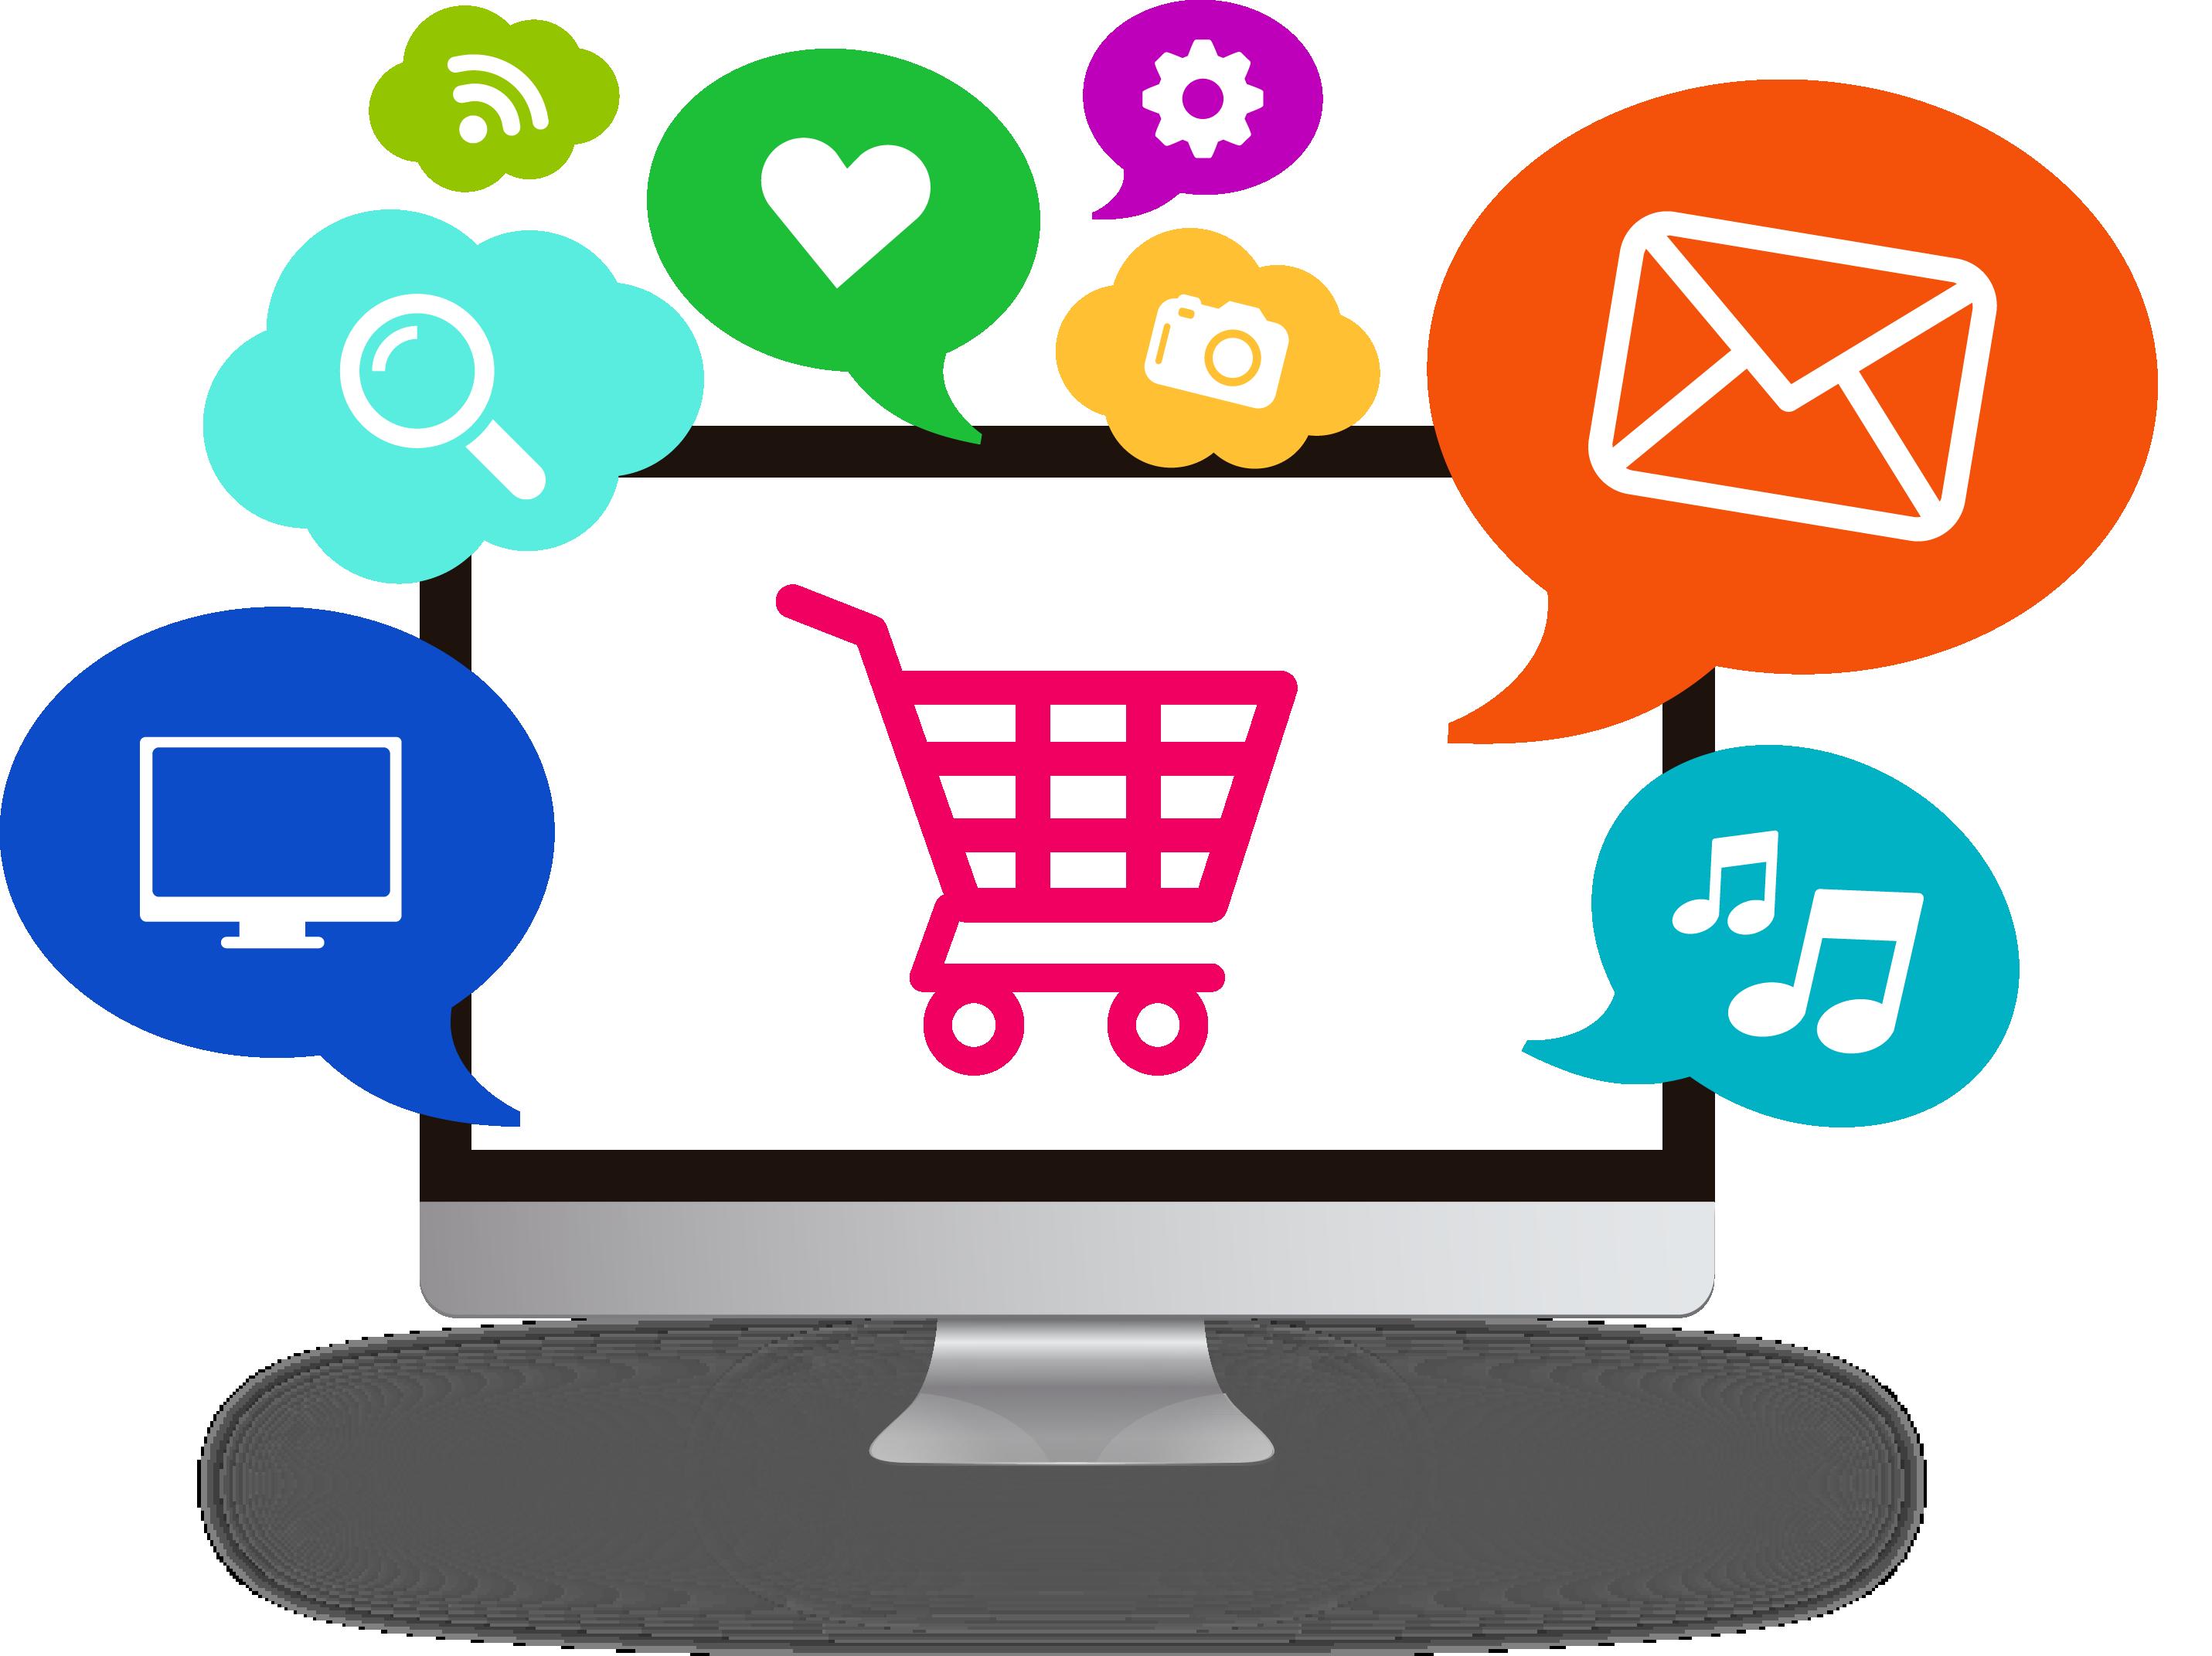 Cadastro de produtos - loja virtual - comercio eletronico - ecommerce